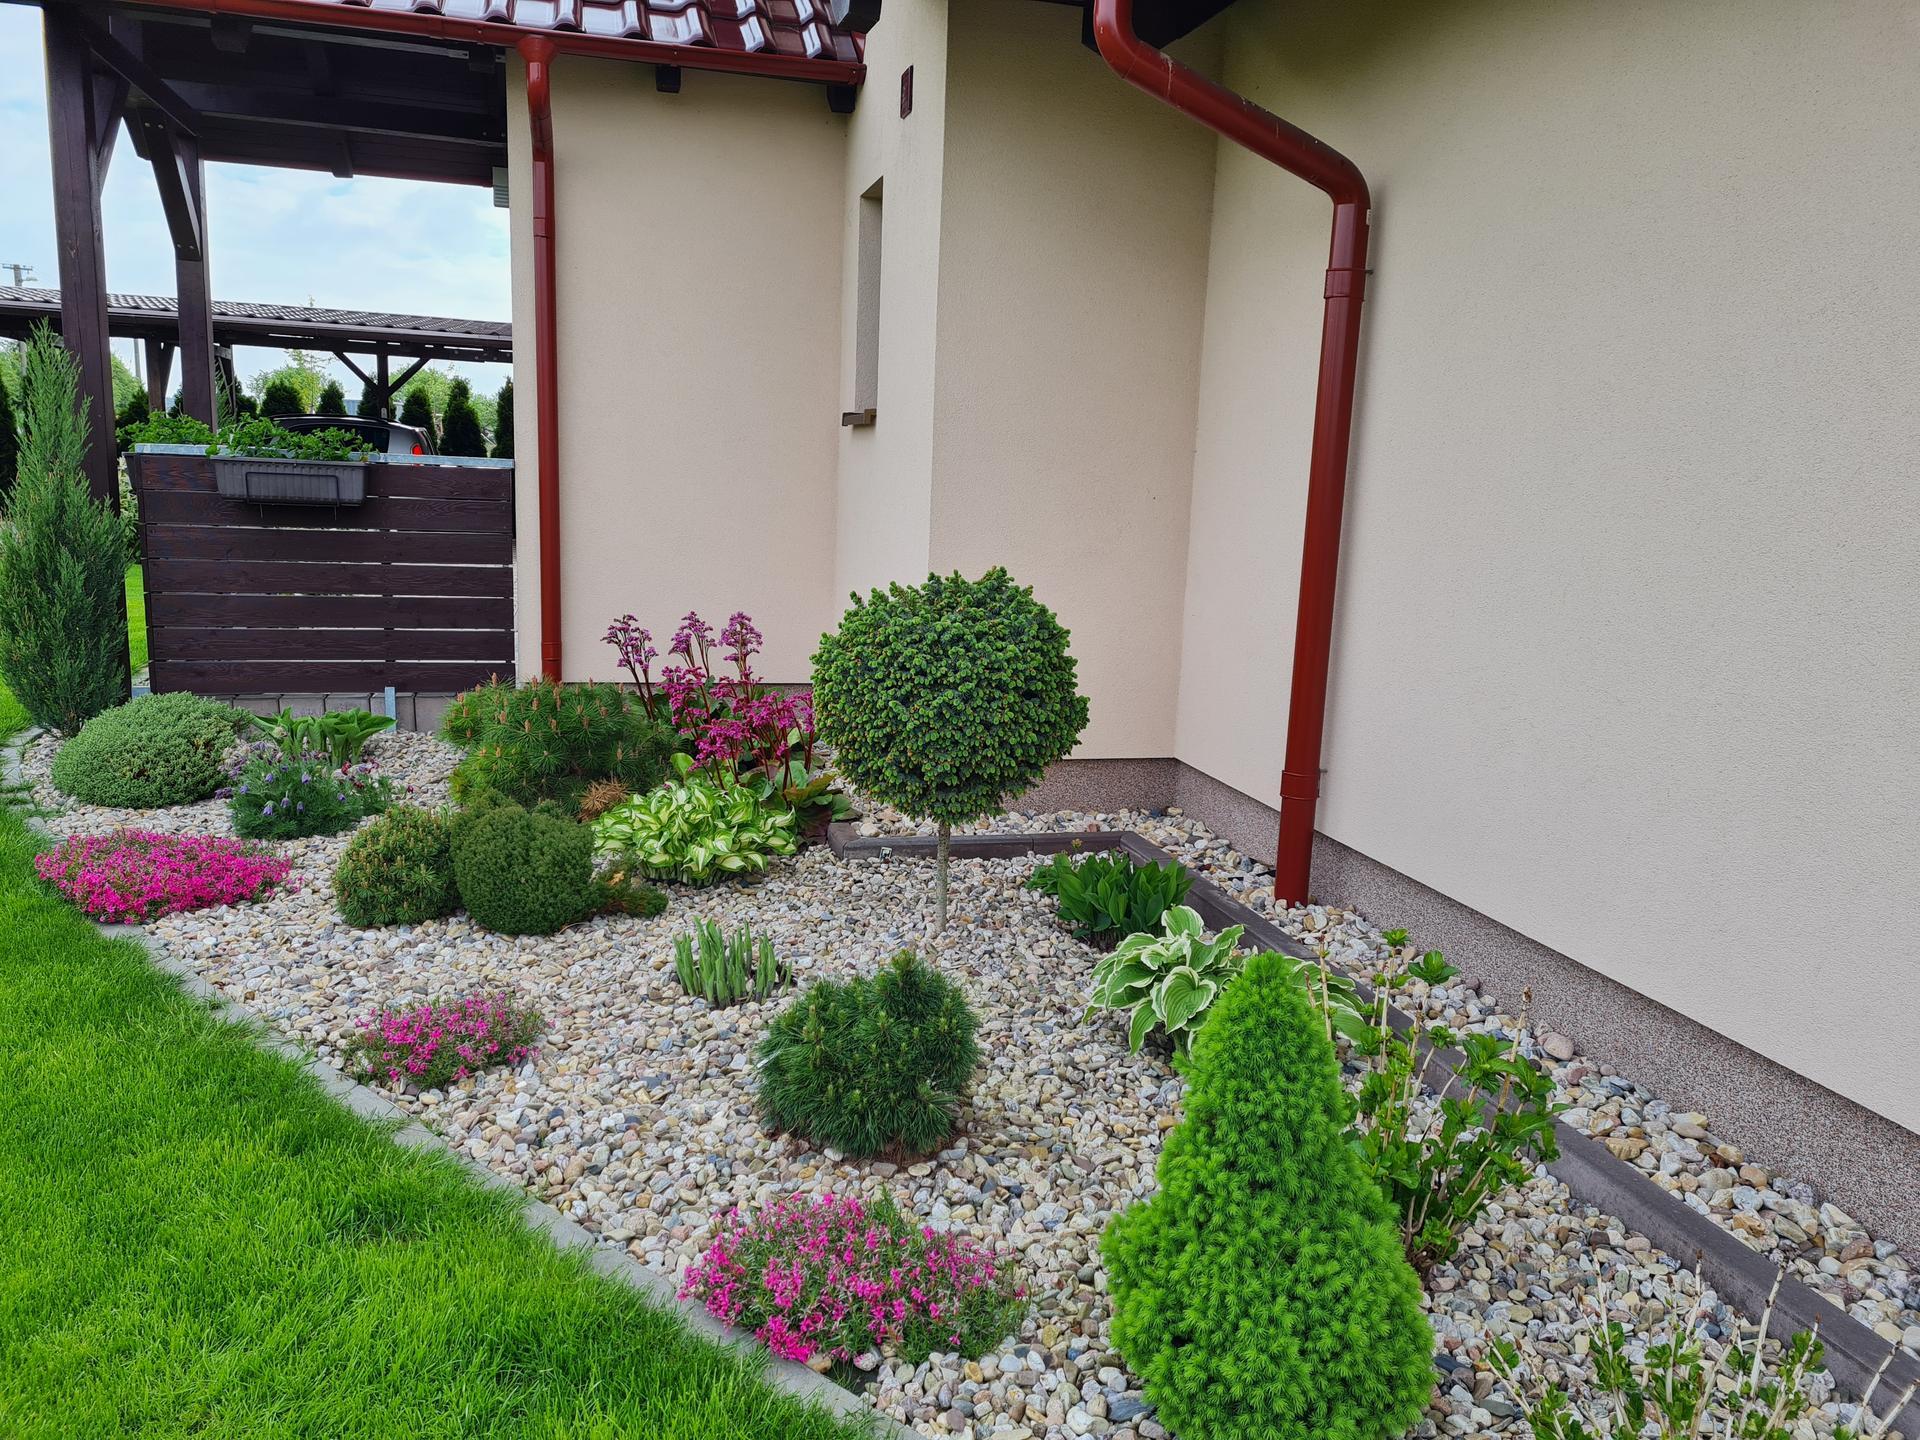 Zahrada 2021 - Obrázek č. 10